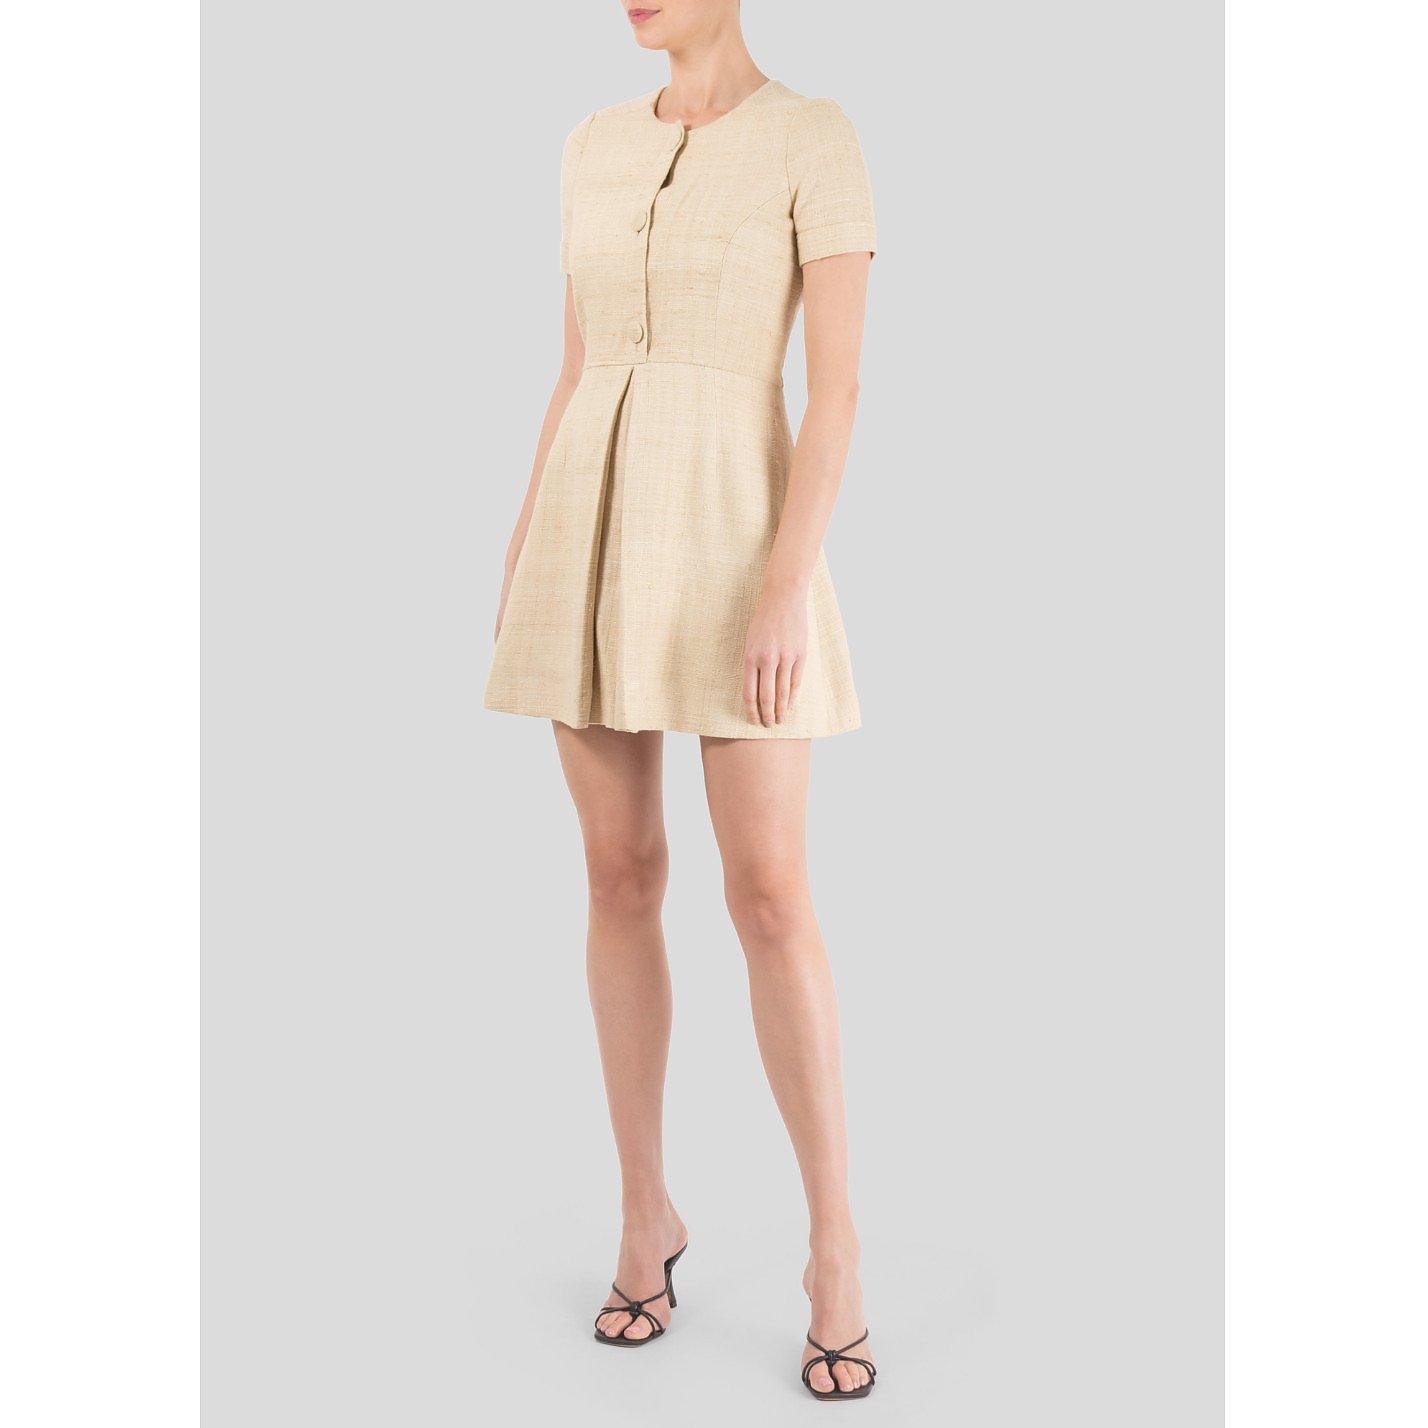 Balenciaga Woven Silk Mini Dress